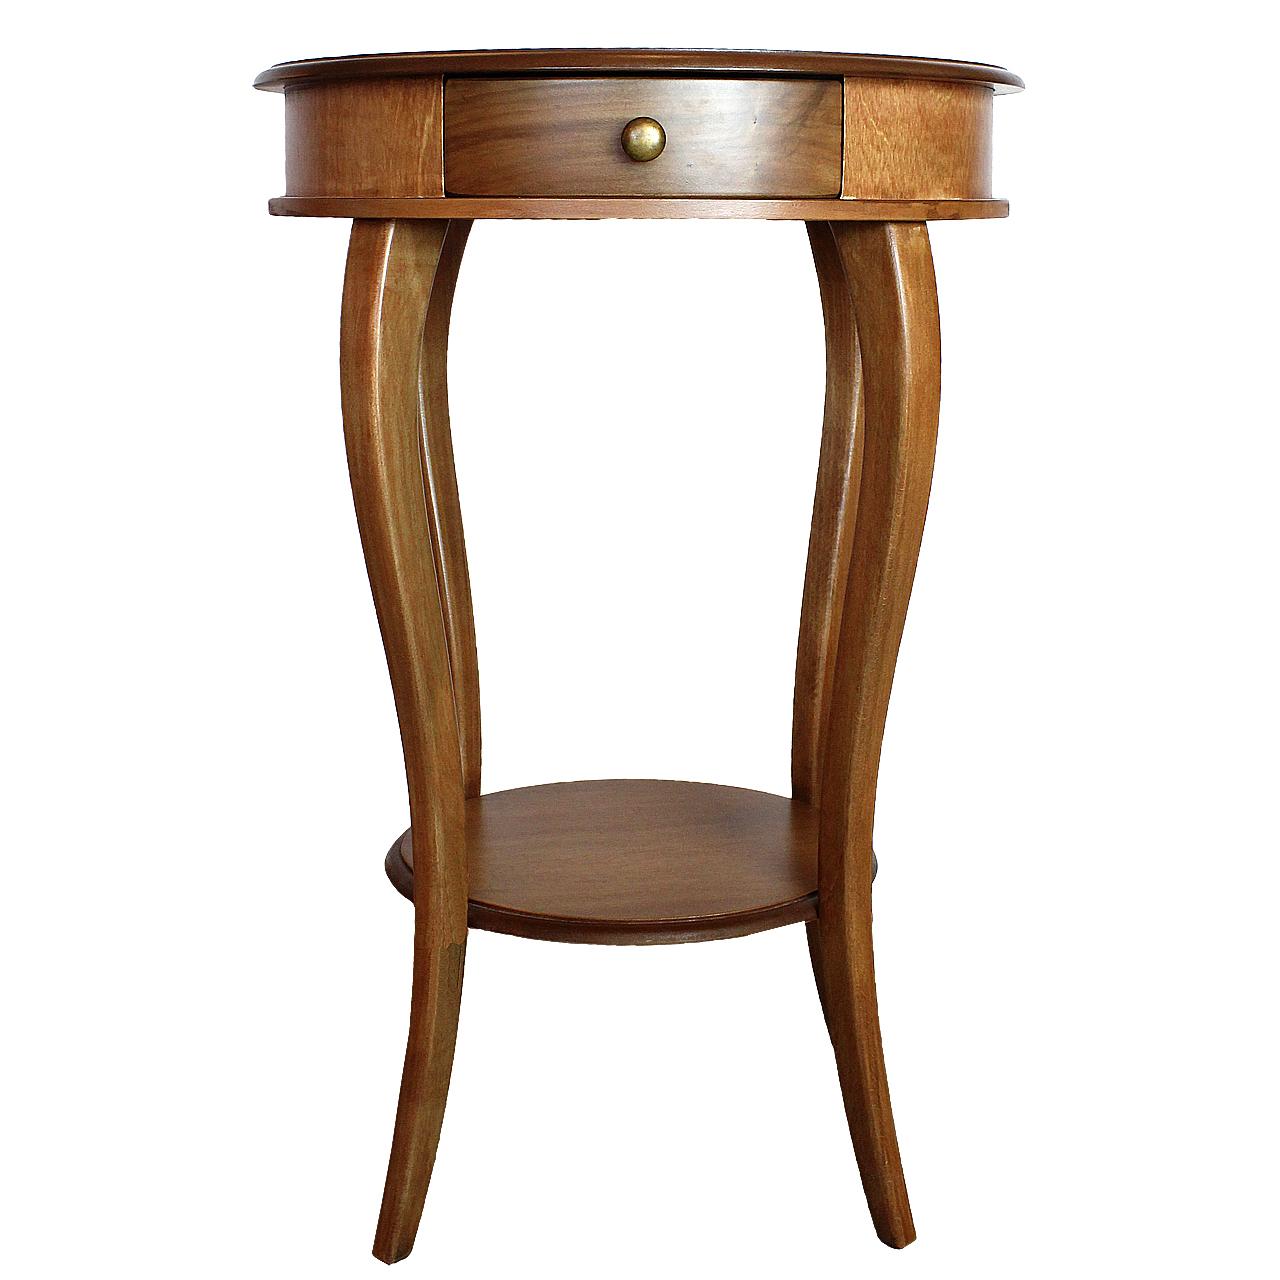 Masuta rotunda Belle din lemn maro 75x50 cm